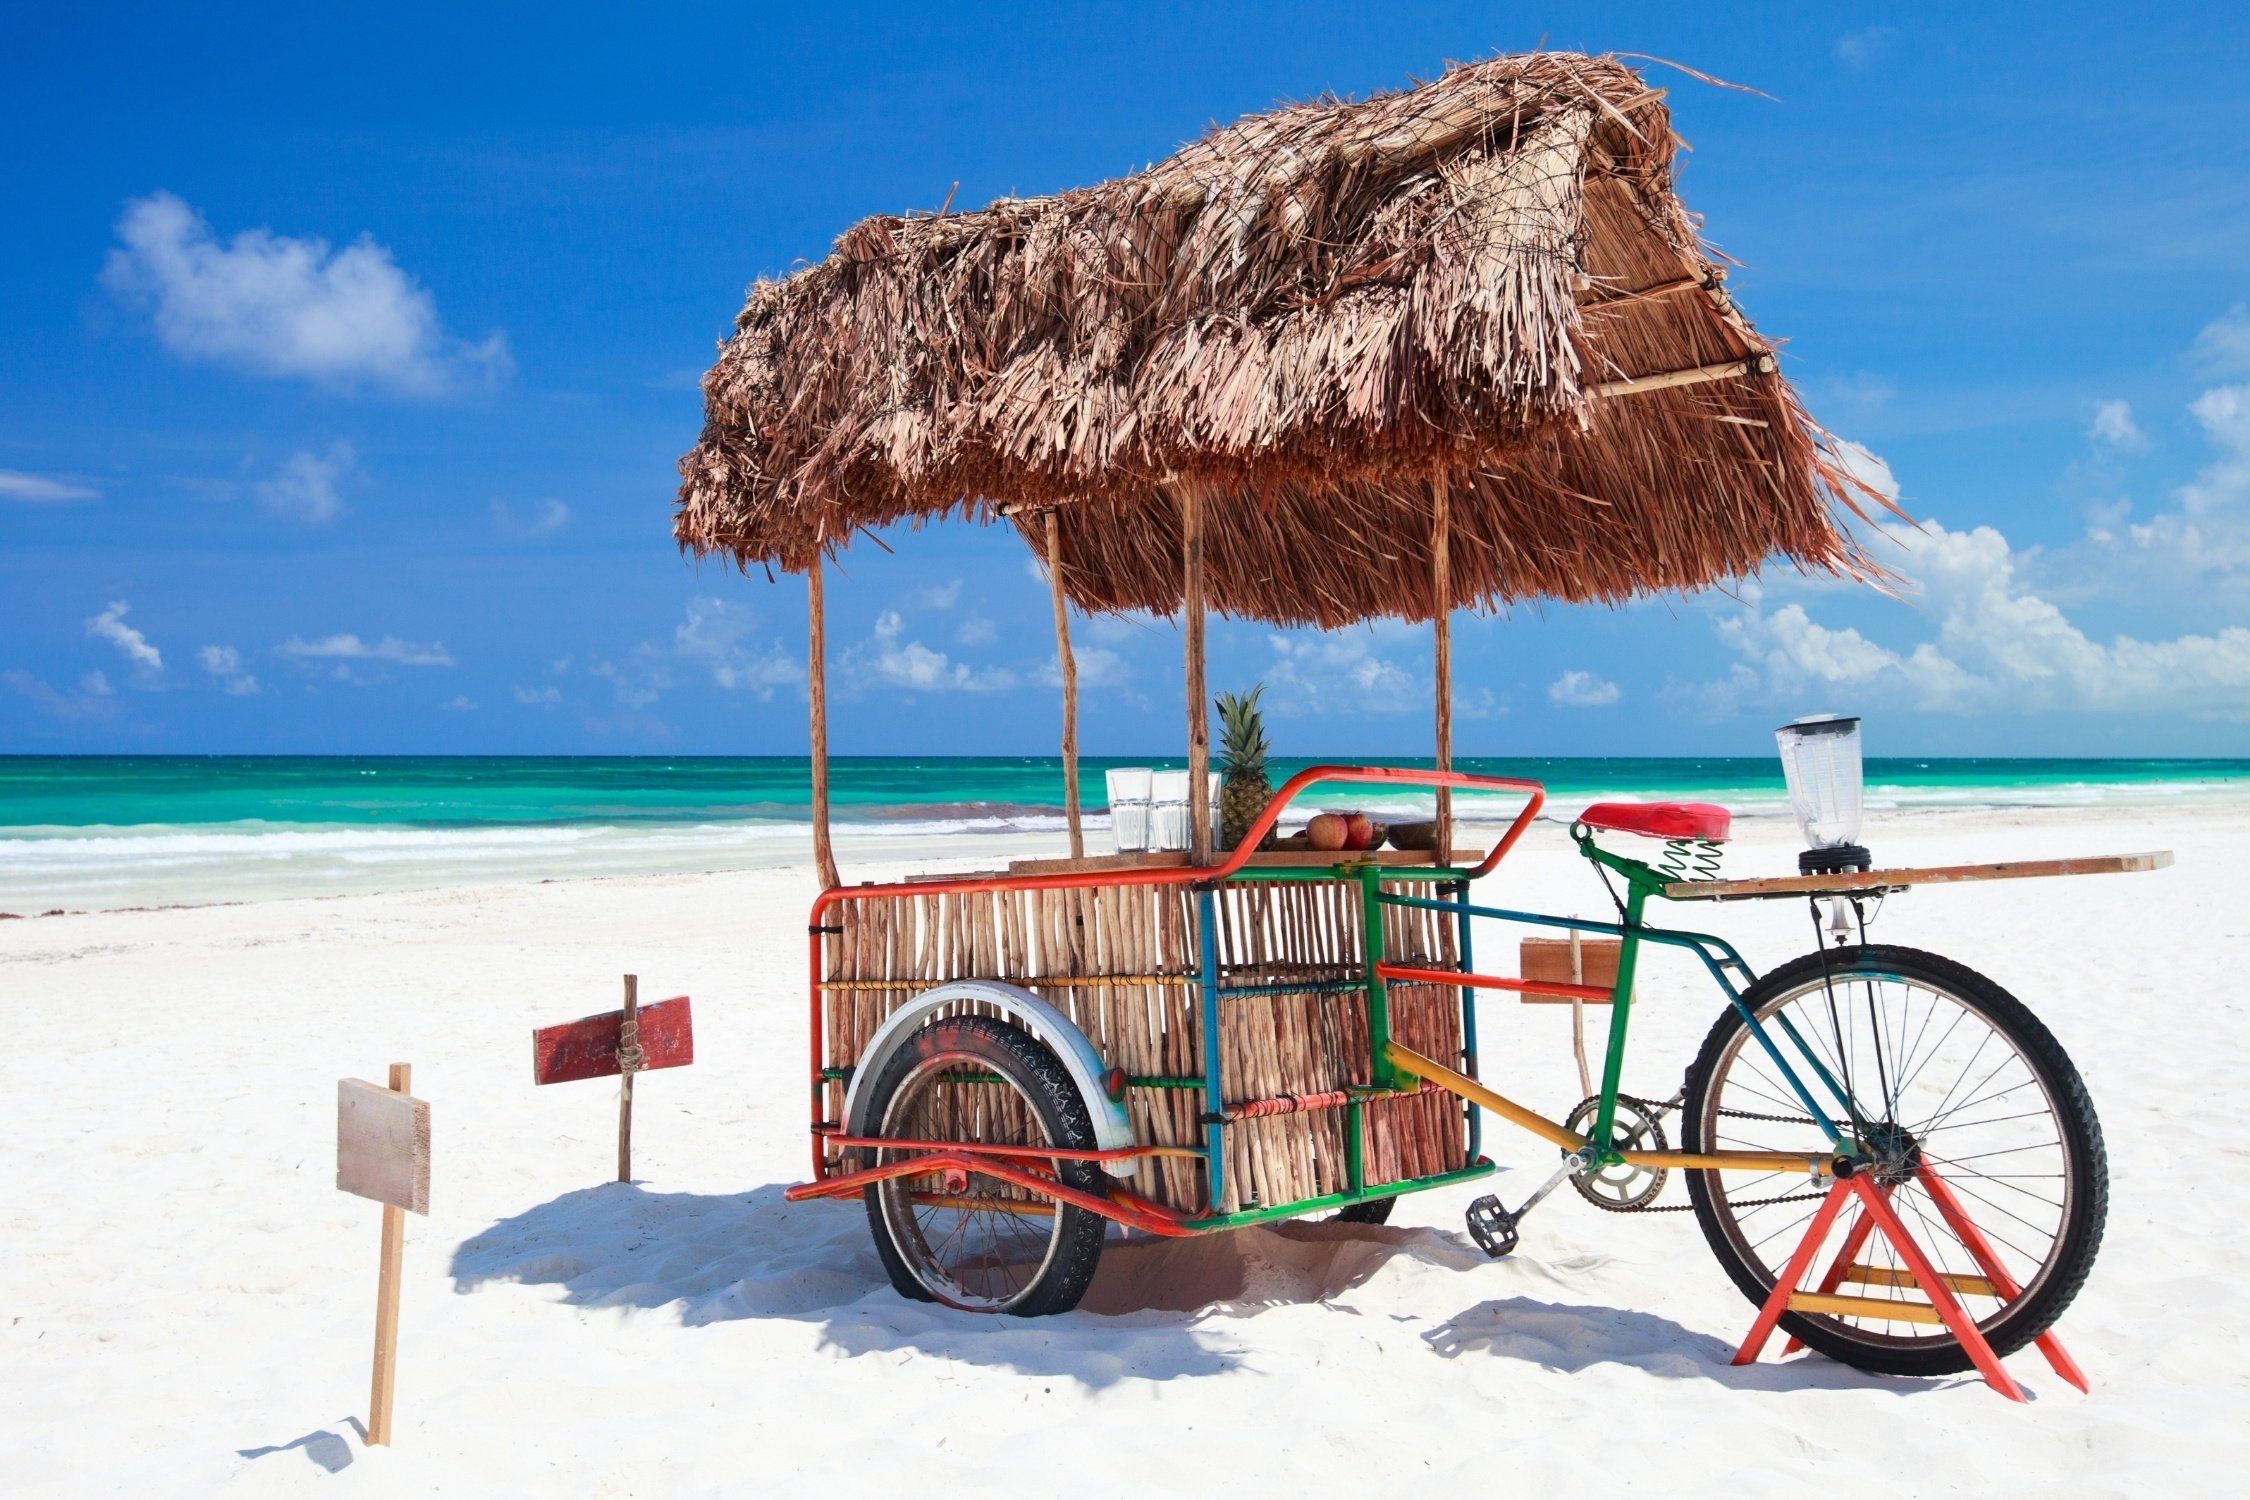 Beach bike on the beach in Tulum with perfect beach weather